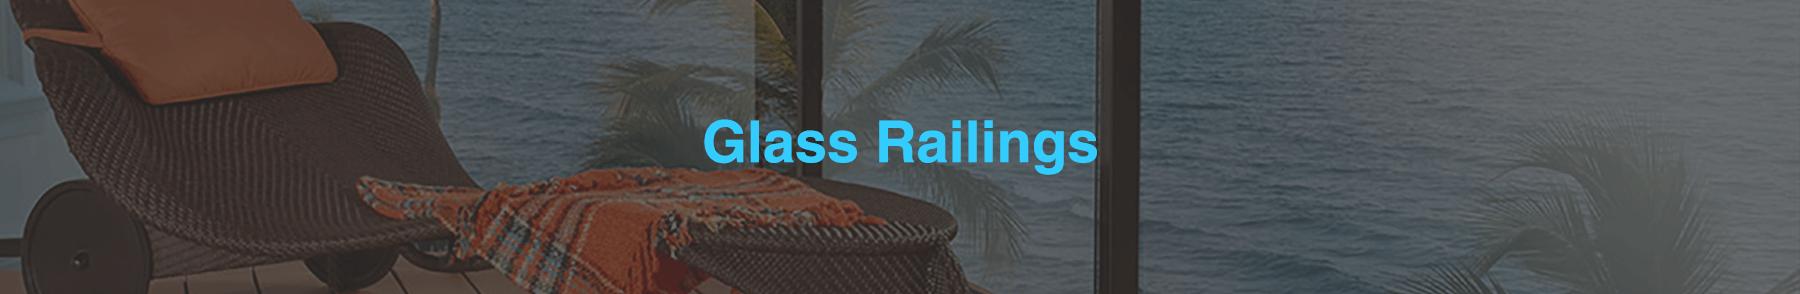 Glass Railings Toronto & Etobicoke